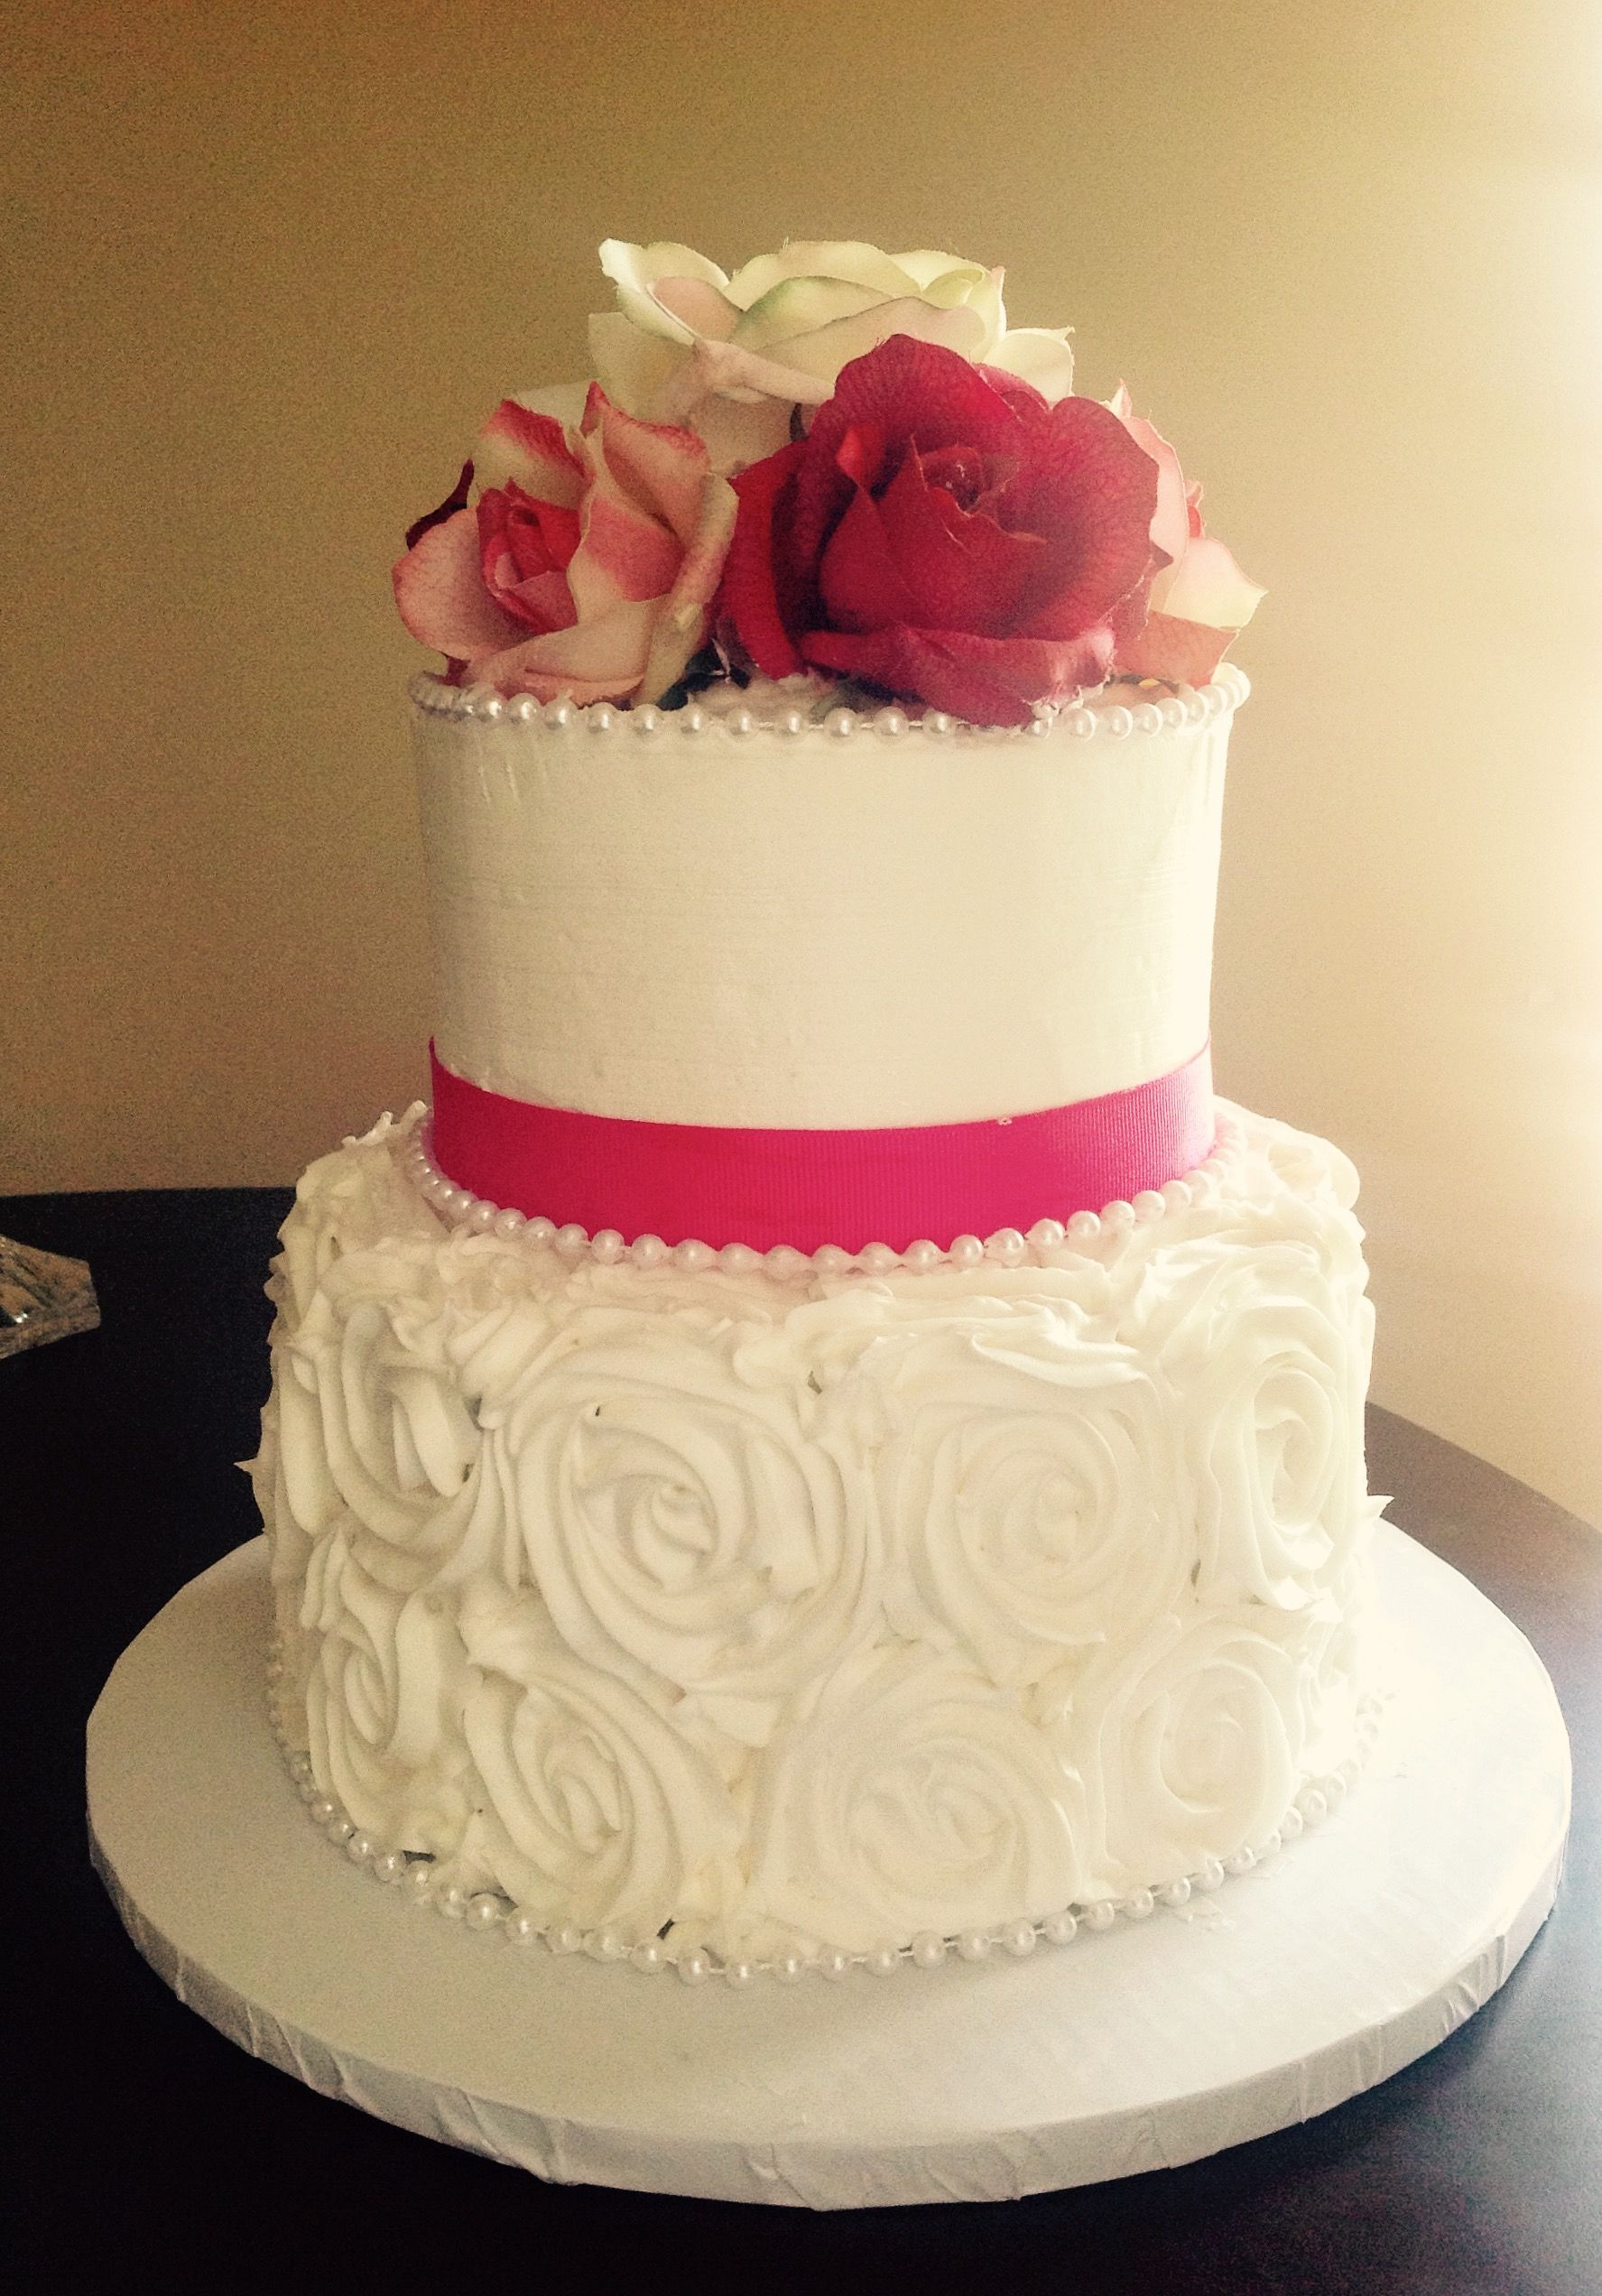 2 Tier White Buttercream Wedding Cake With